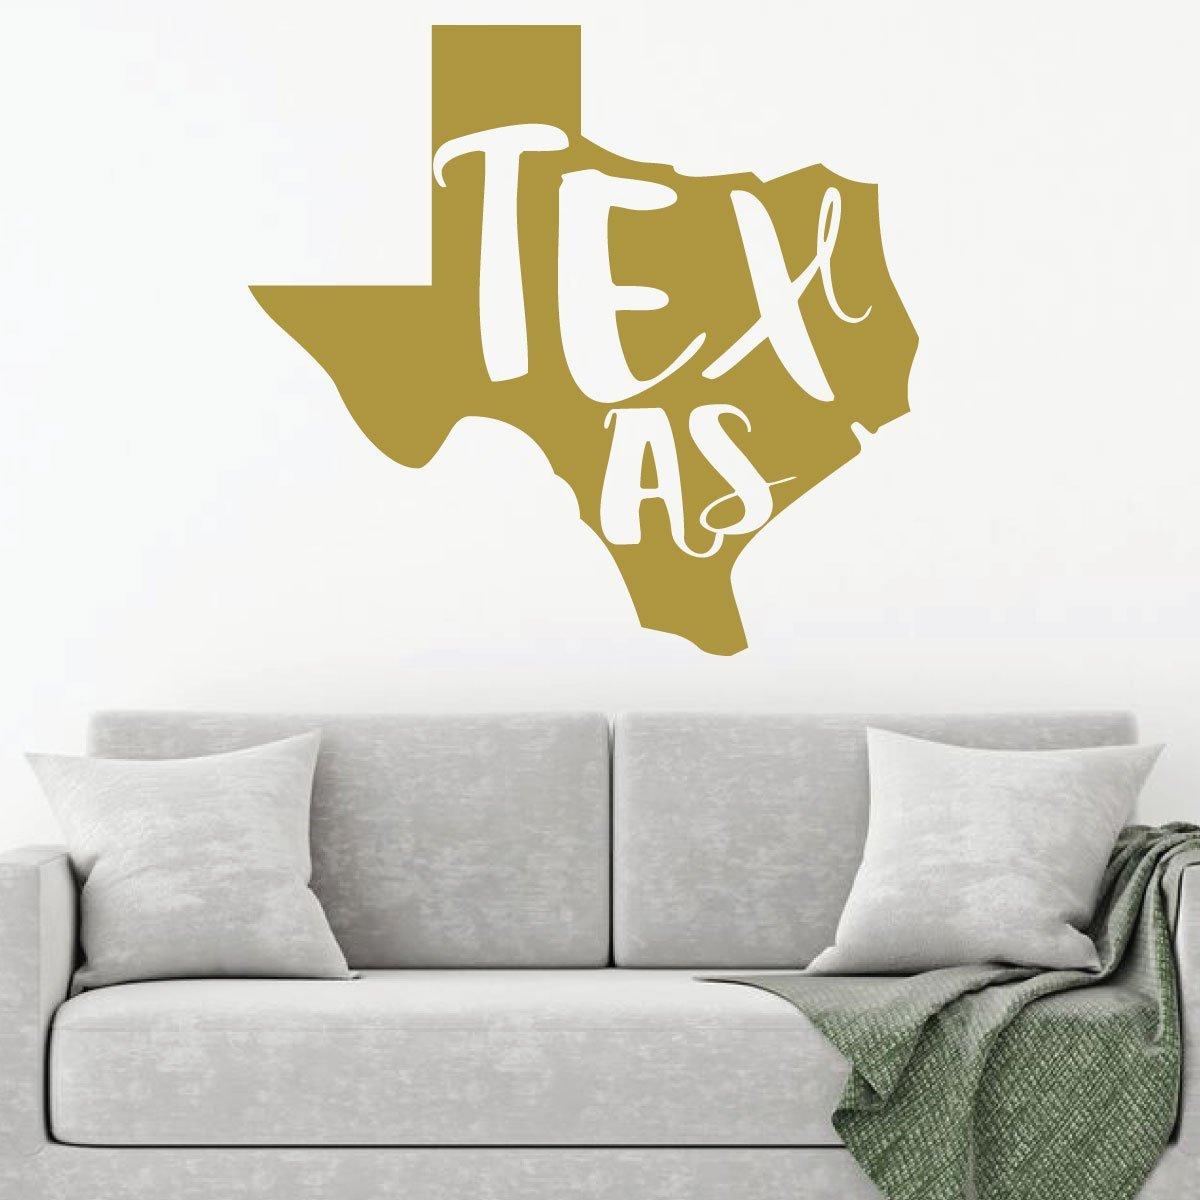 Amazon.com: Texas Wall Decor - State Silhouette - Vinyl Art Decal ...